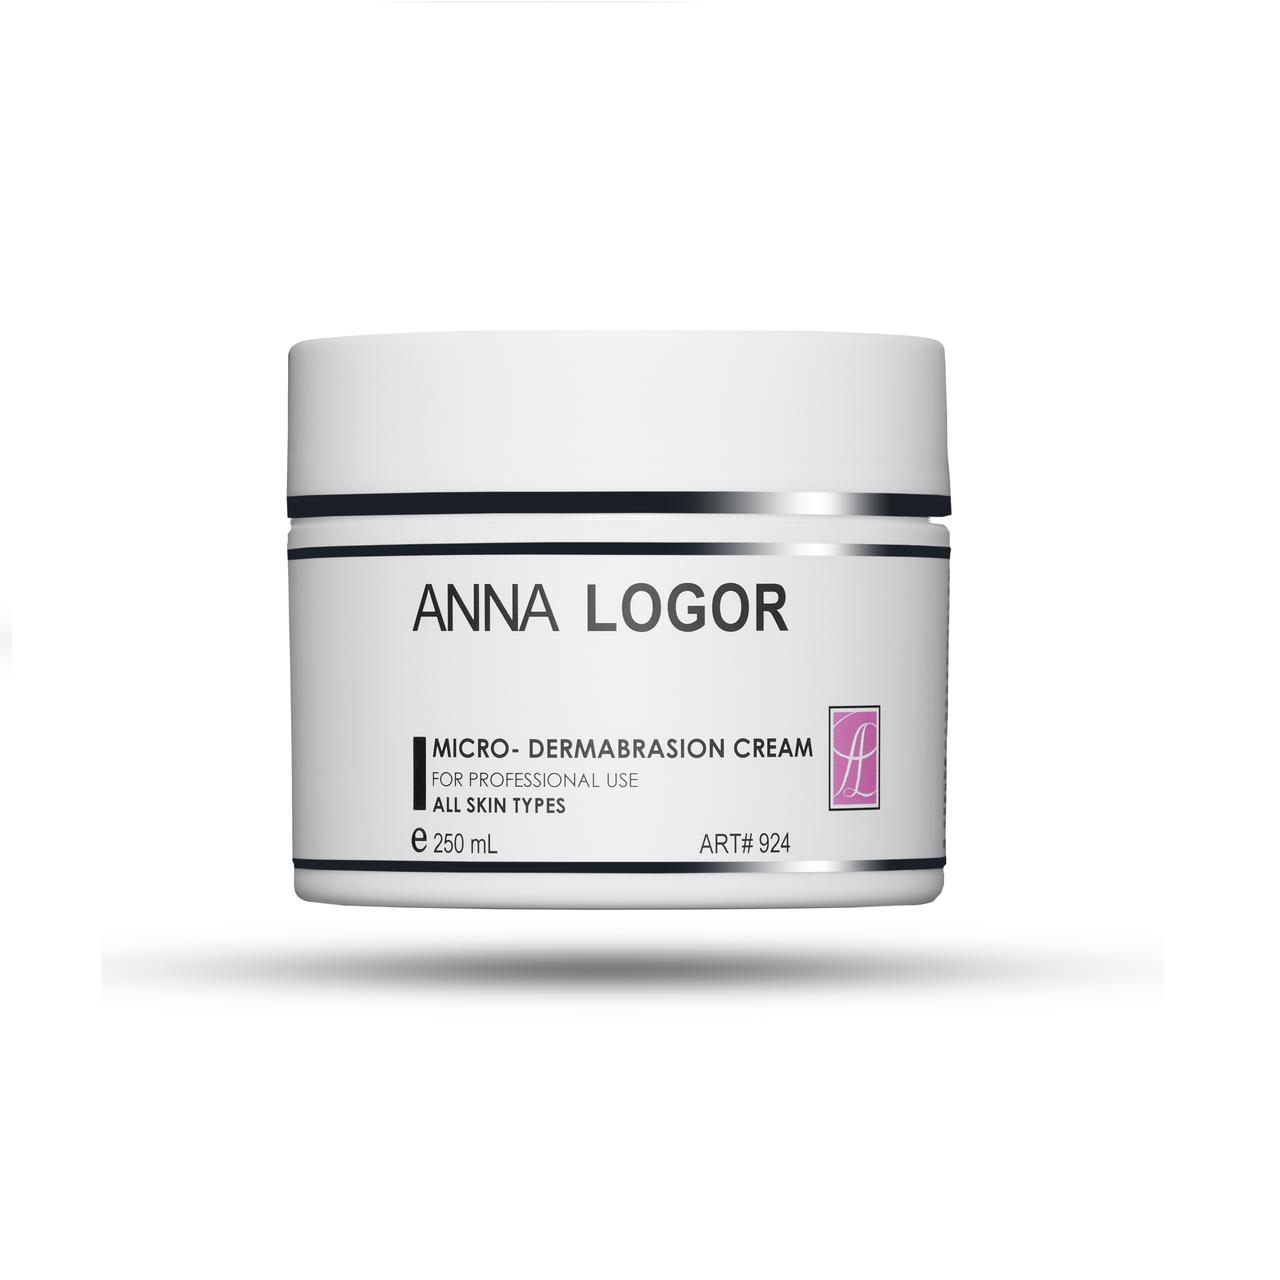 Очищуючий крем-скраб Анна Логор / Anna Logor Micro-dermabrasion Cream Код 924